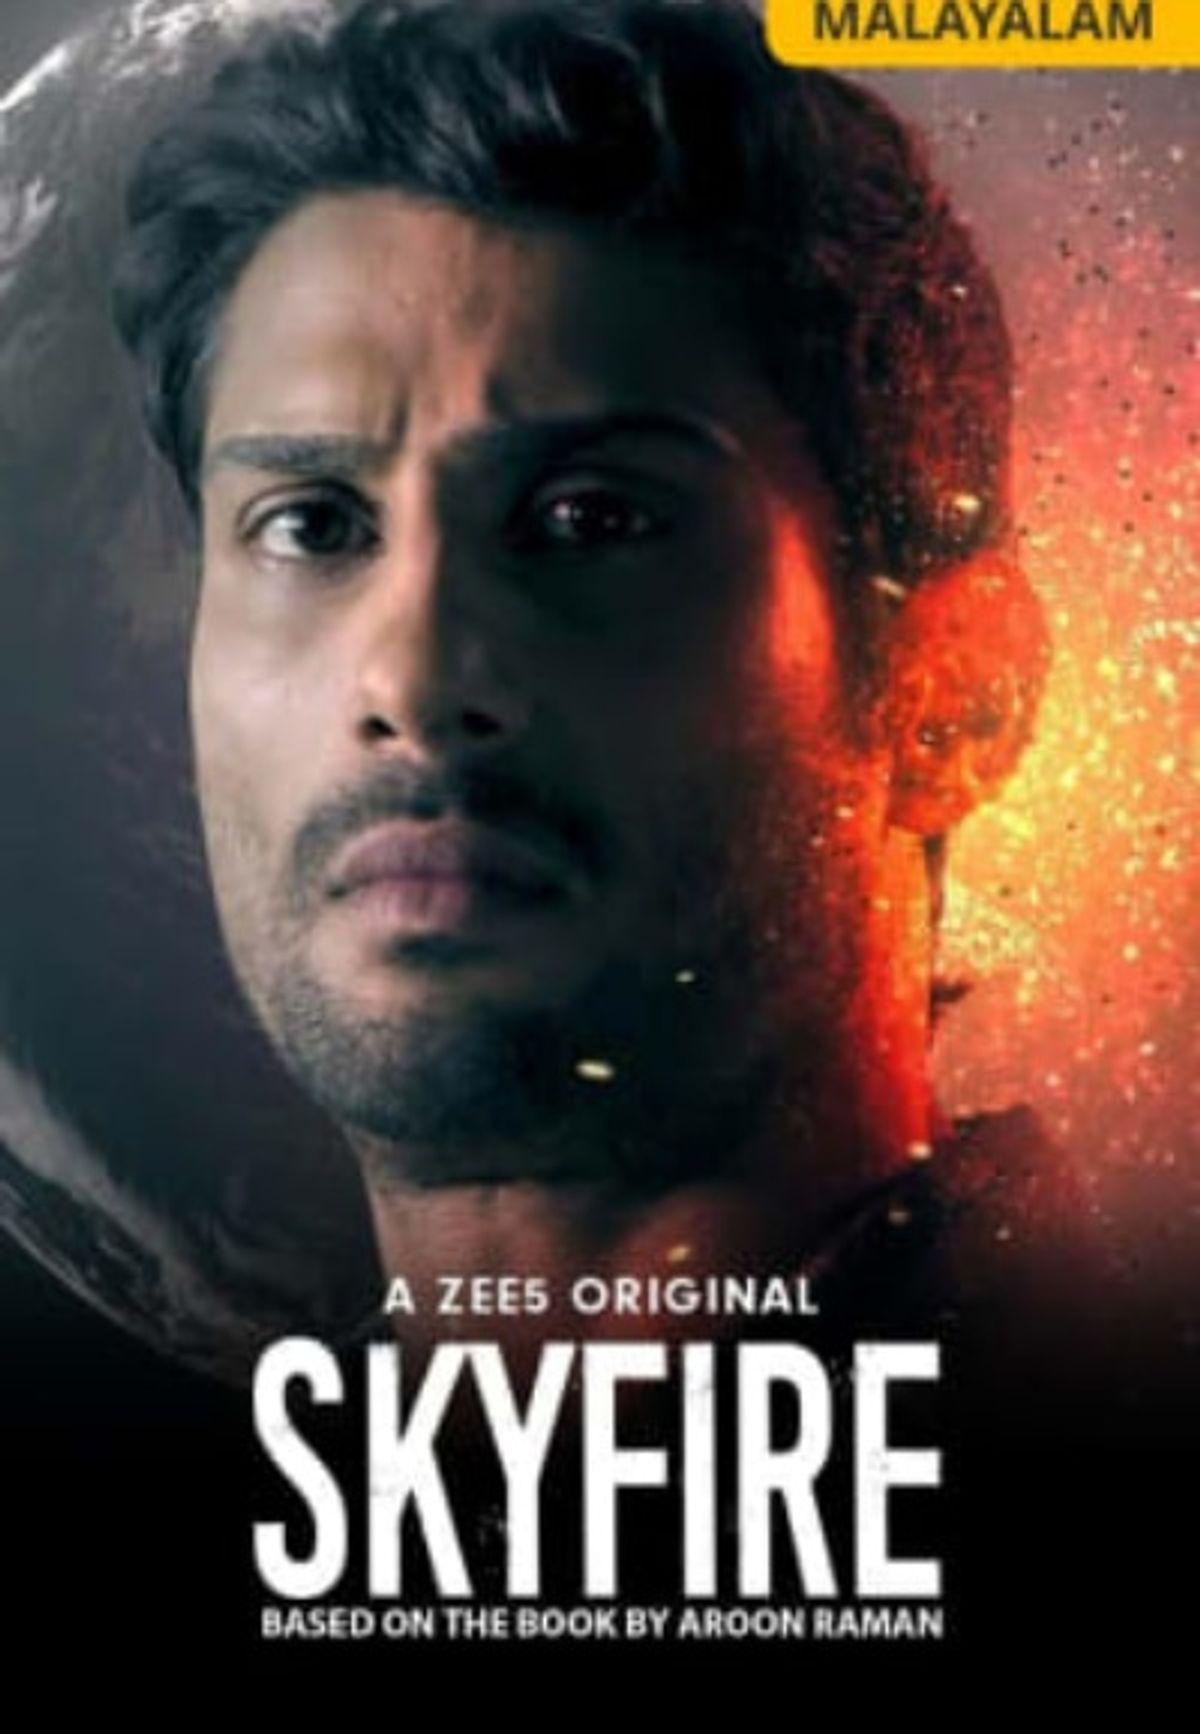 Best Sci Fi shows in Malayalam